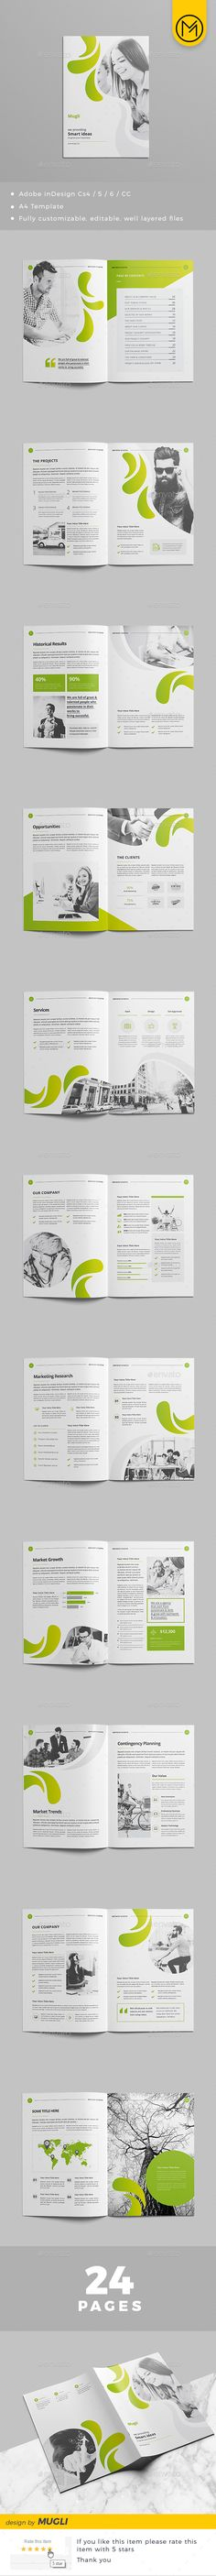 Design Brochure Template InDesign INDD - 24 Pages